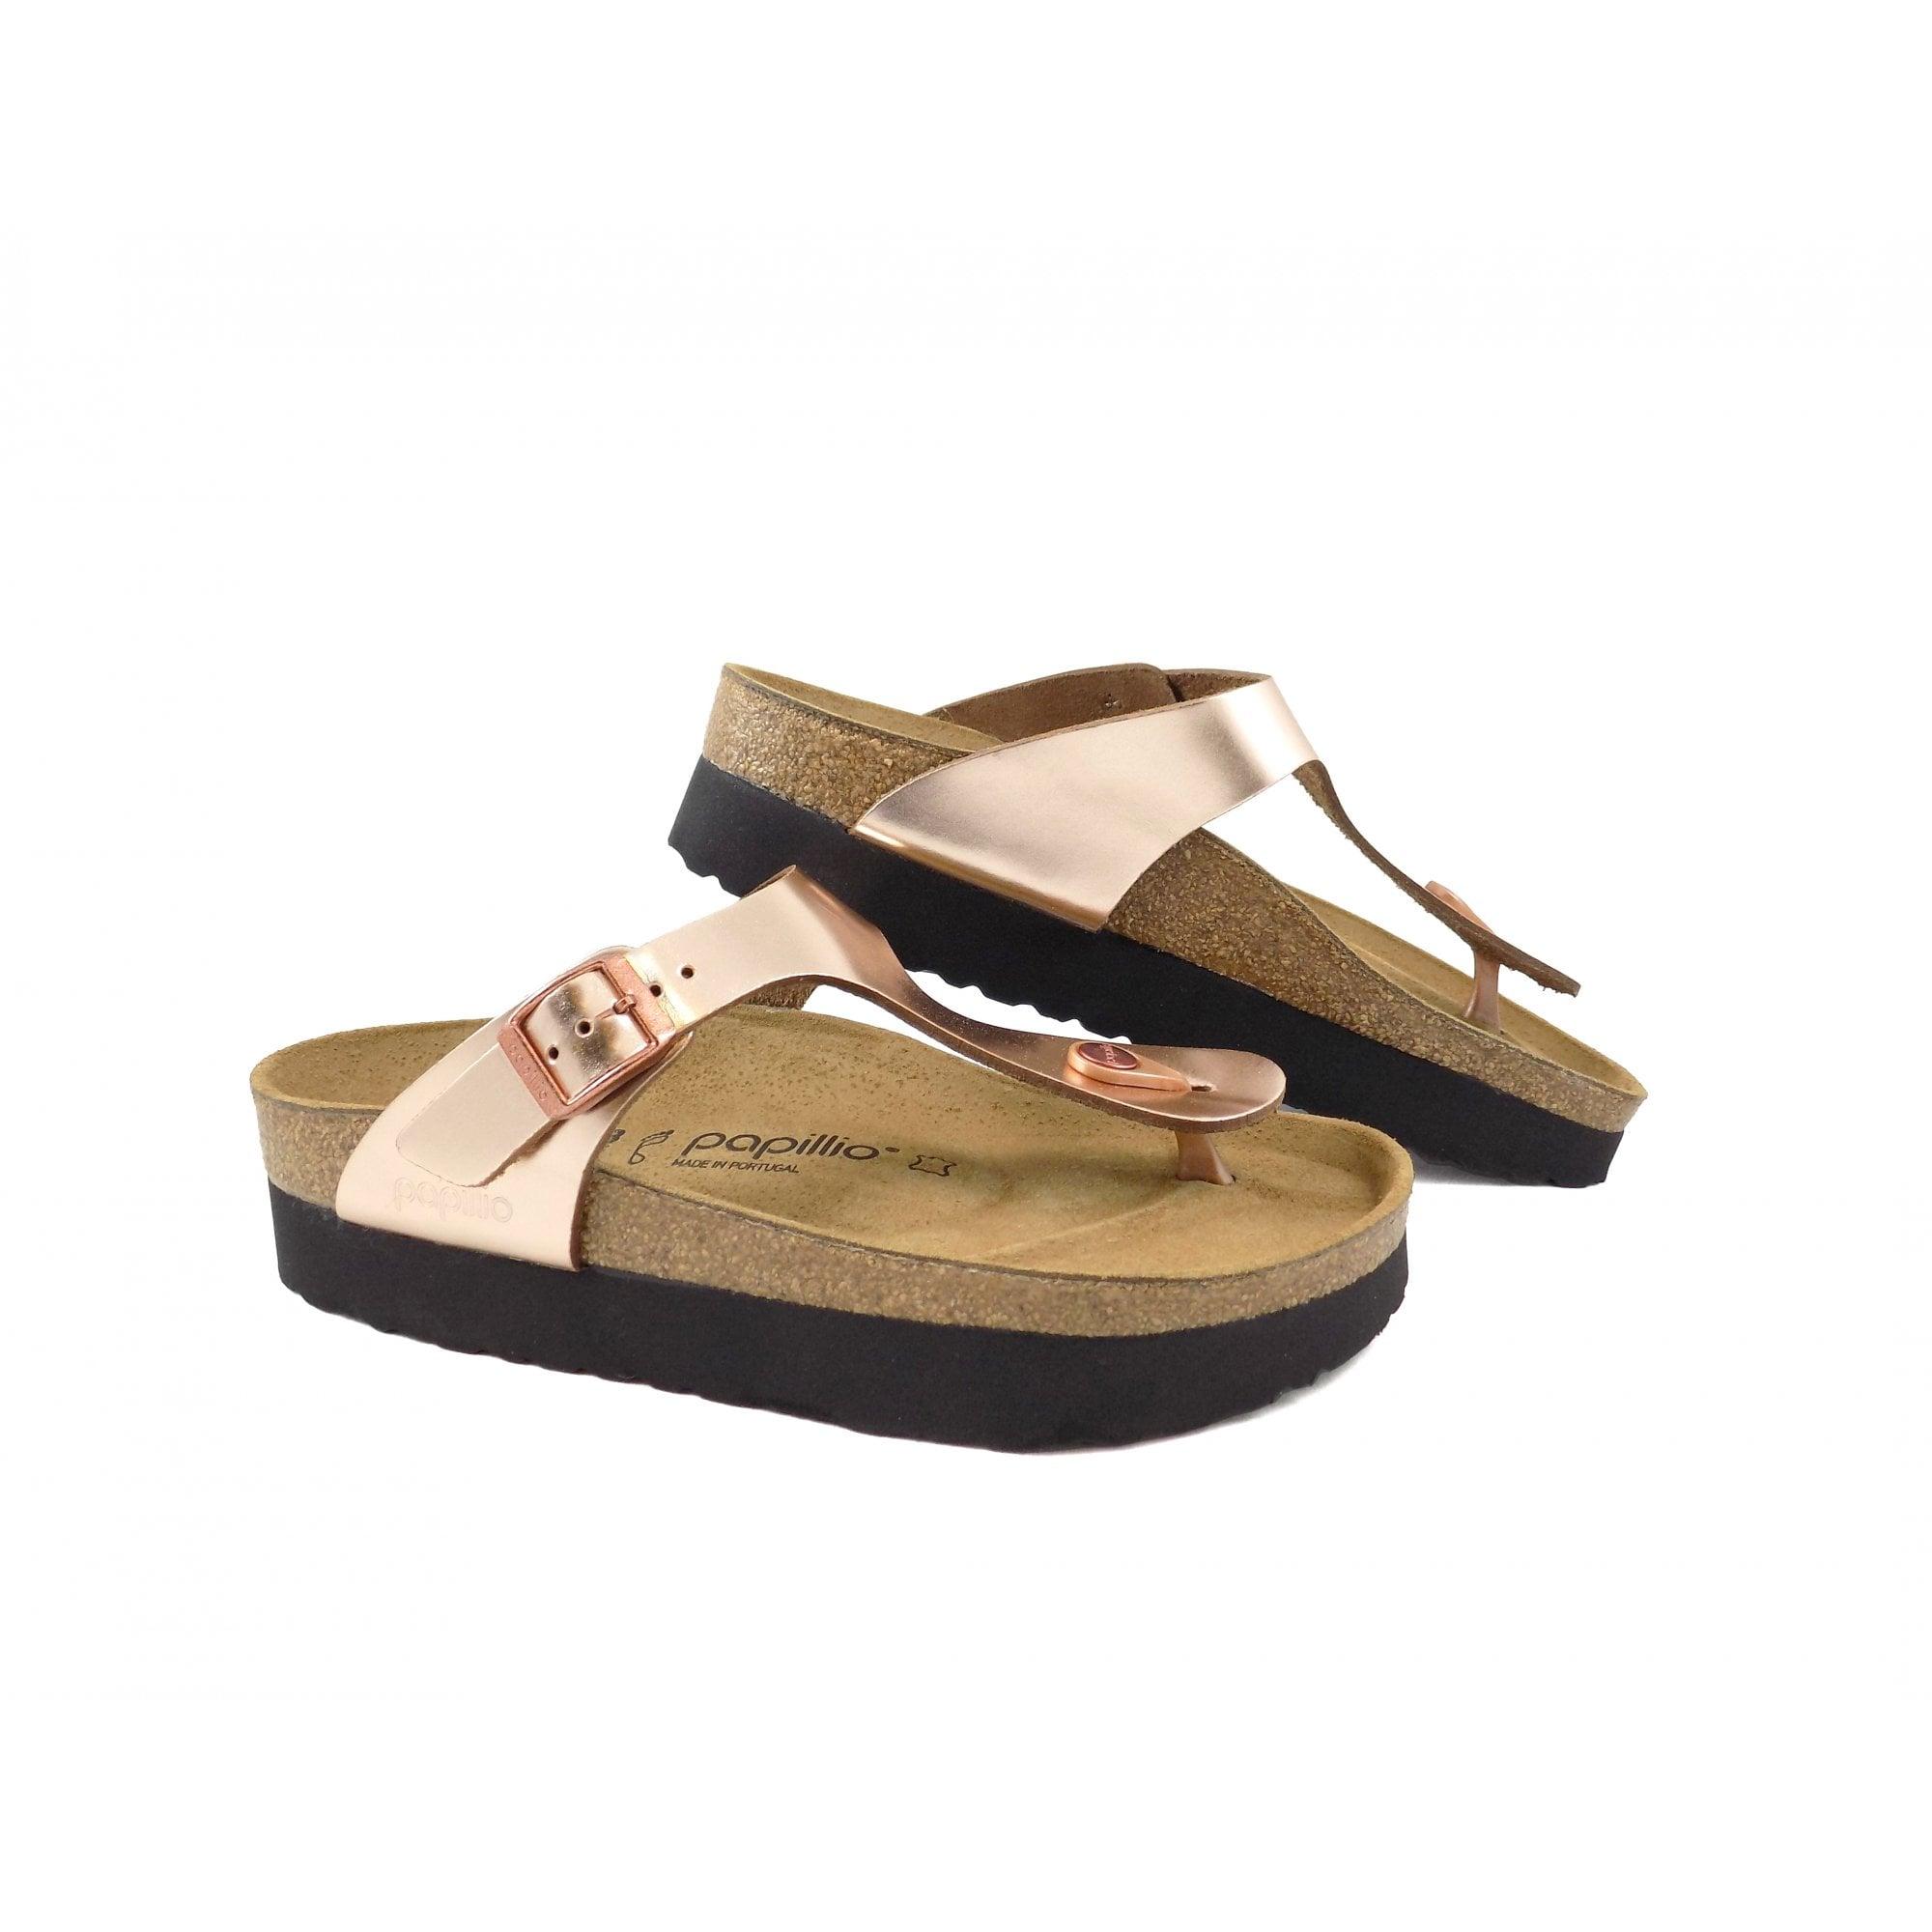 Birkenstock Gizeh Toe Post Sandals in